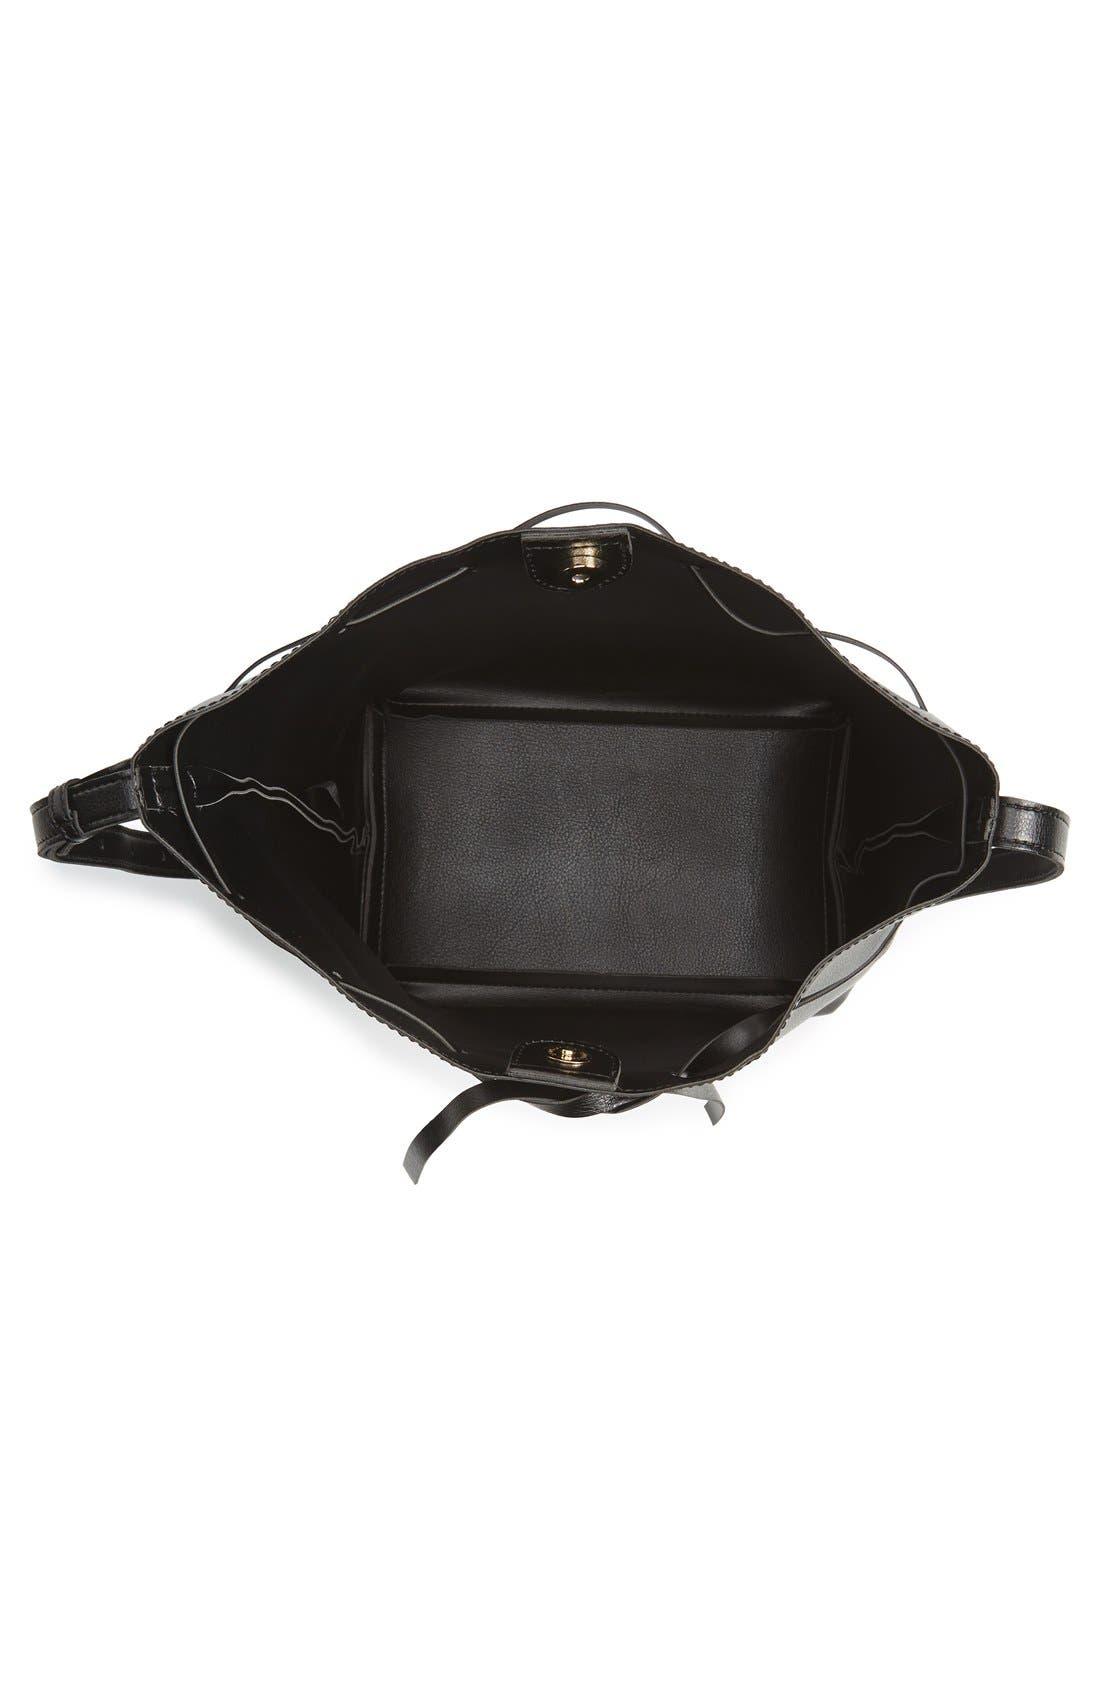 SOLE SOCIETY,                             'Blackwood' Faux Leather Bucket Bag,                             Alternate thumbnail 4, color,                             001